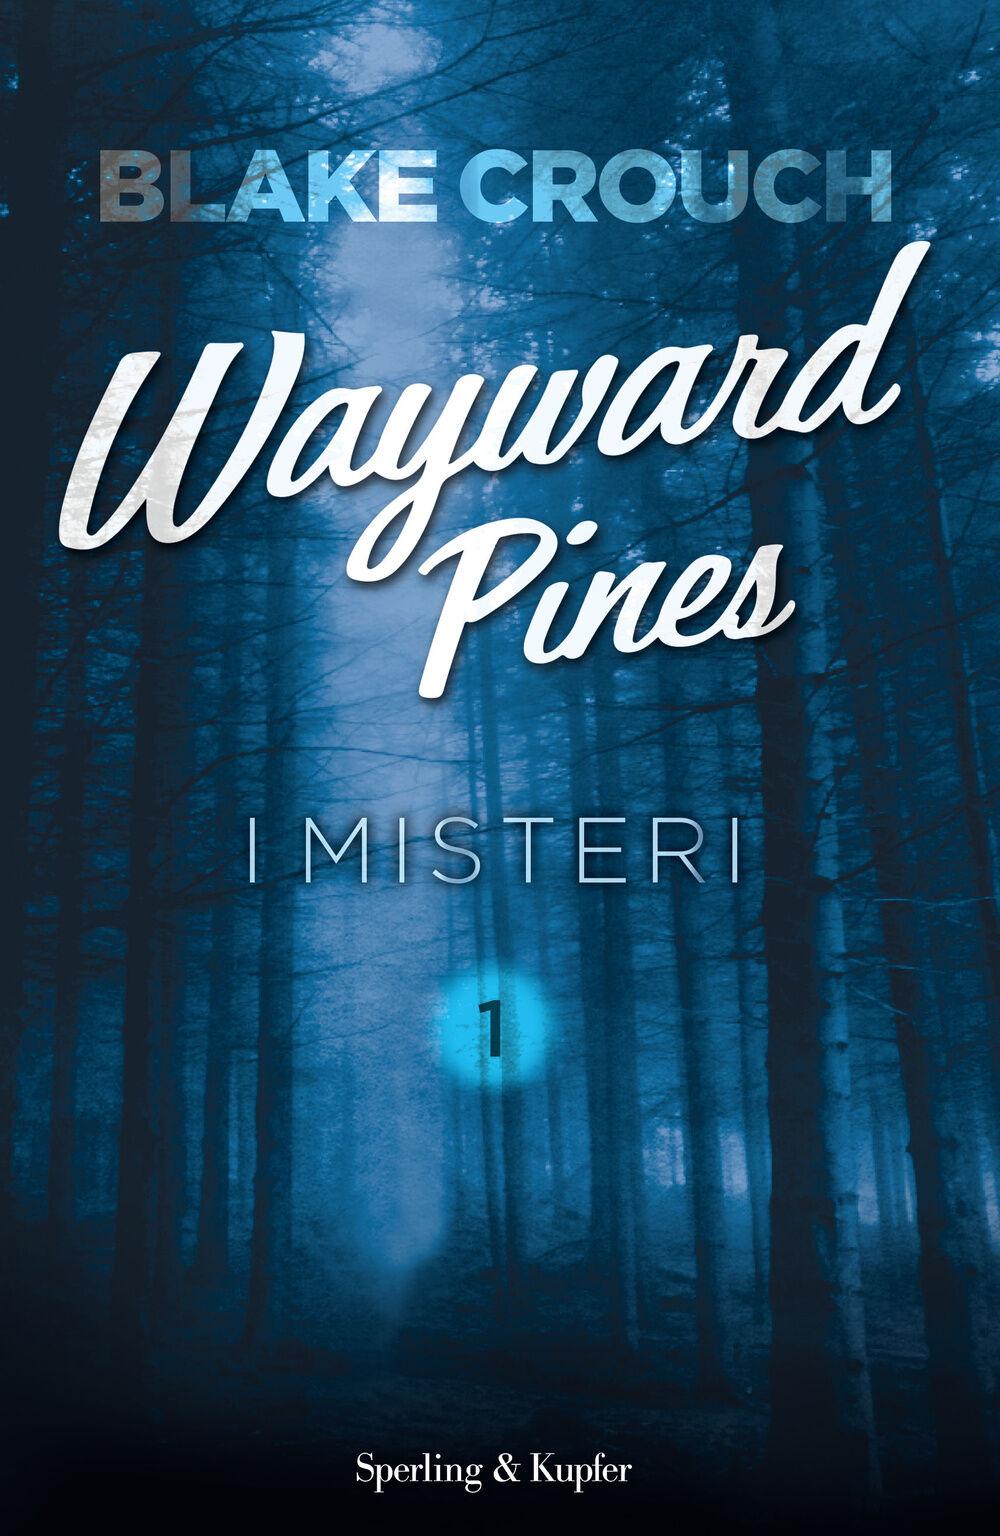 I misteri. Wayward Pines. Vol. 1